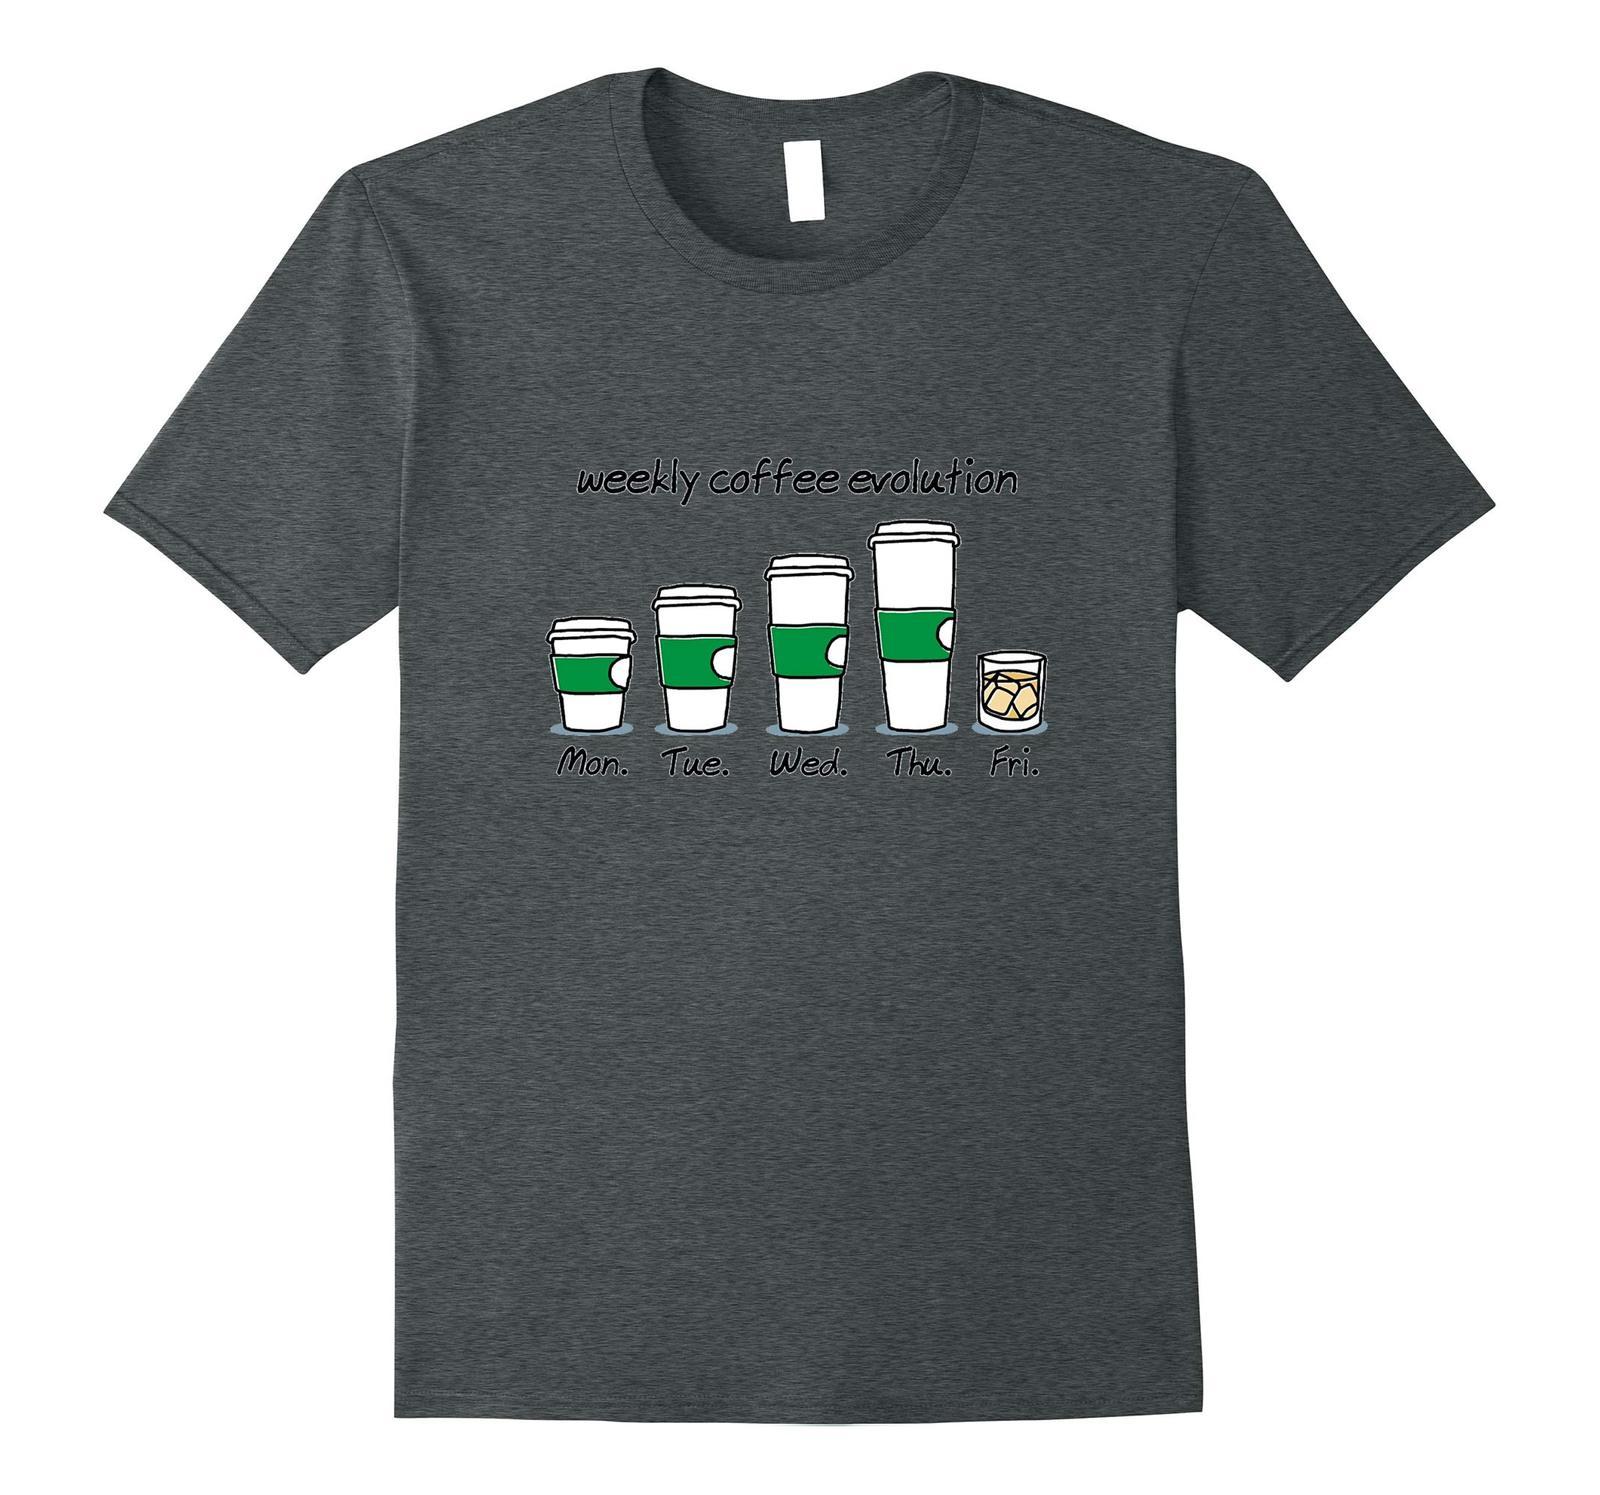 New Shirts - Weekly Coffee Evolution Drink T-Shirt Men